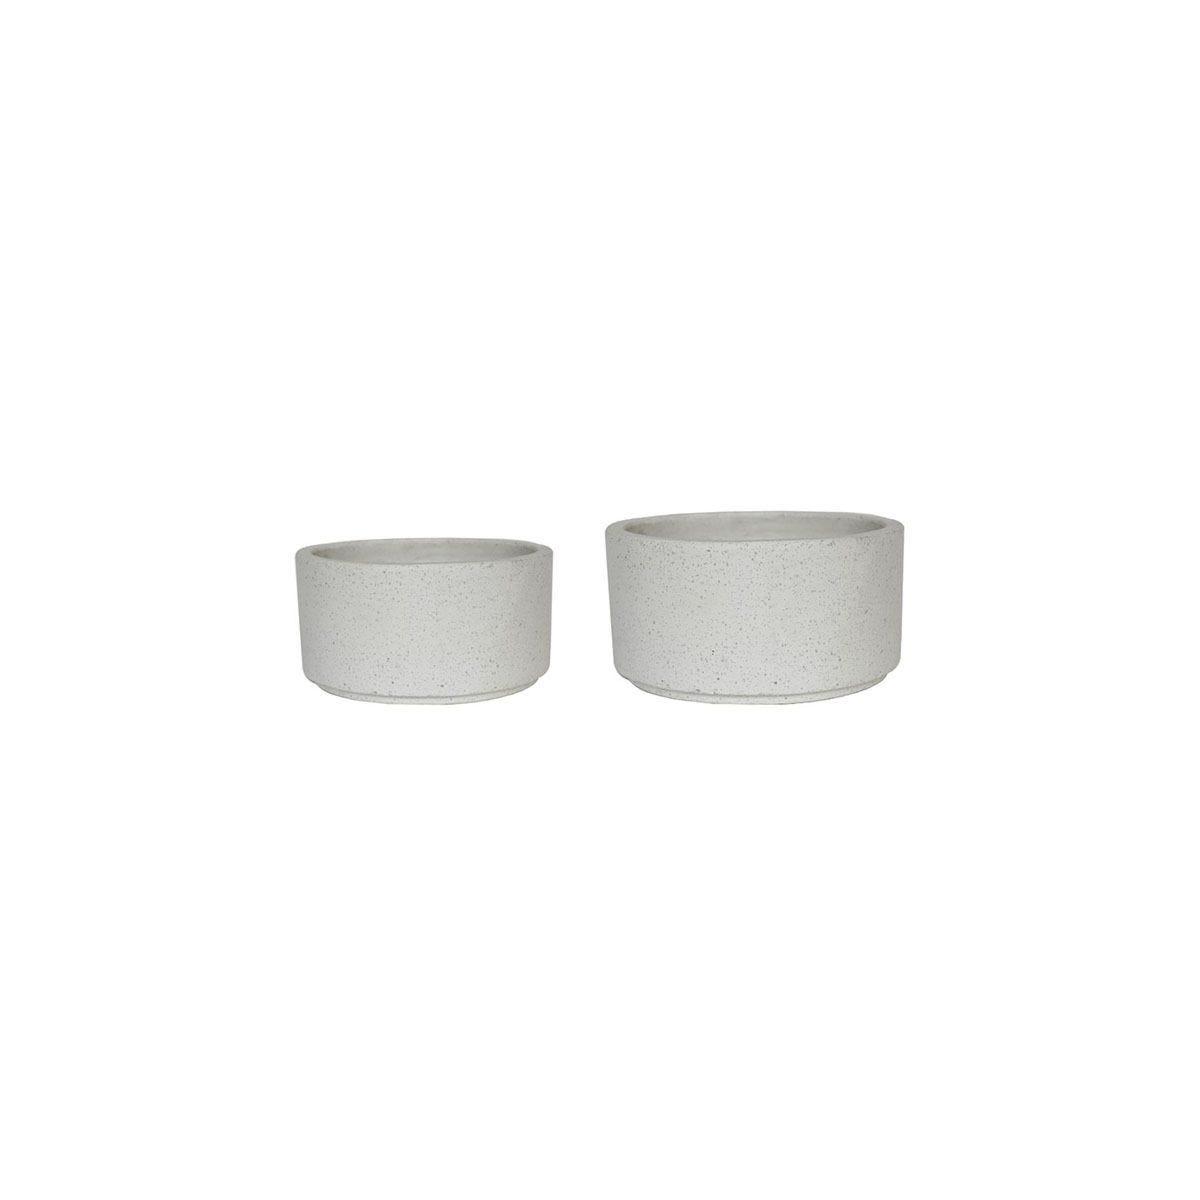 Ivyline Catania Terrazzo Set of 2 Cylinder Bowls - White